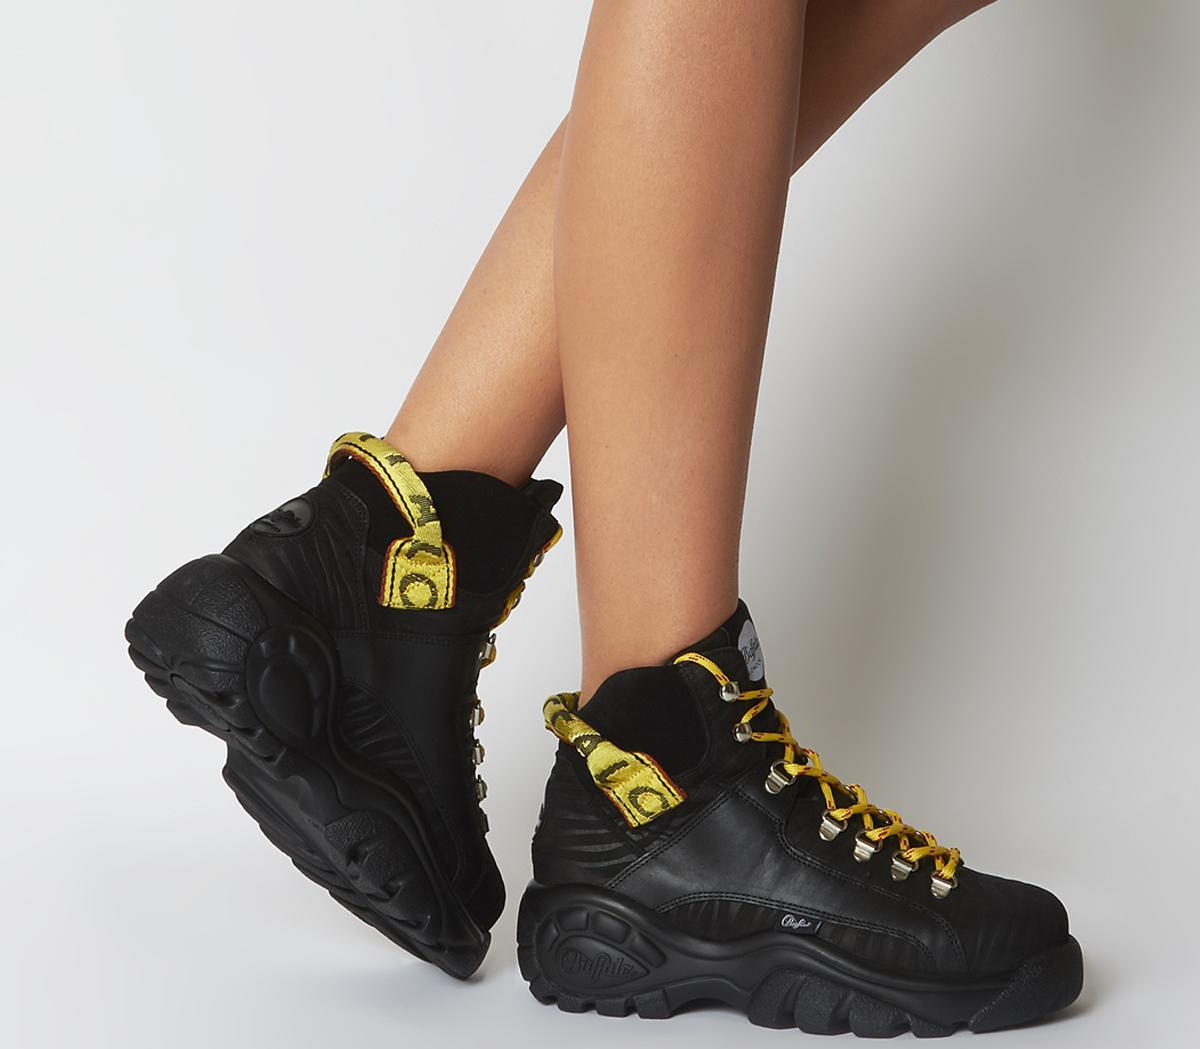 Giselle Sneaker Boots Black